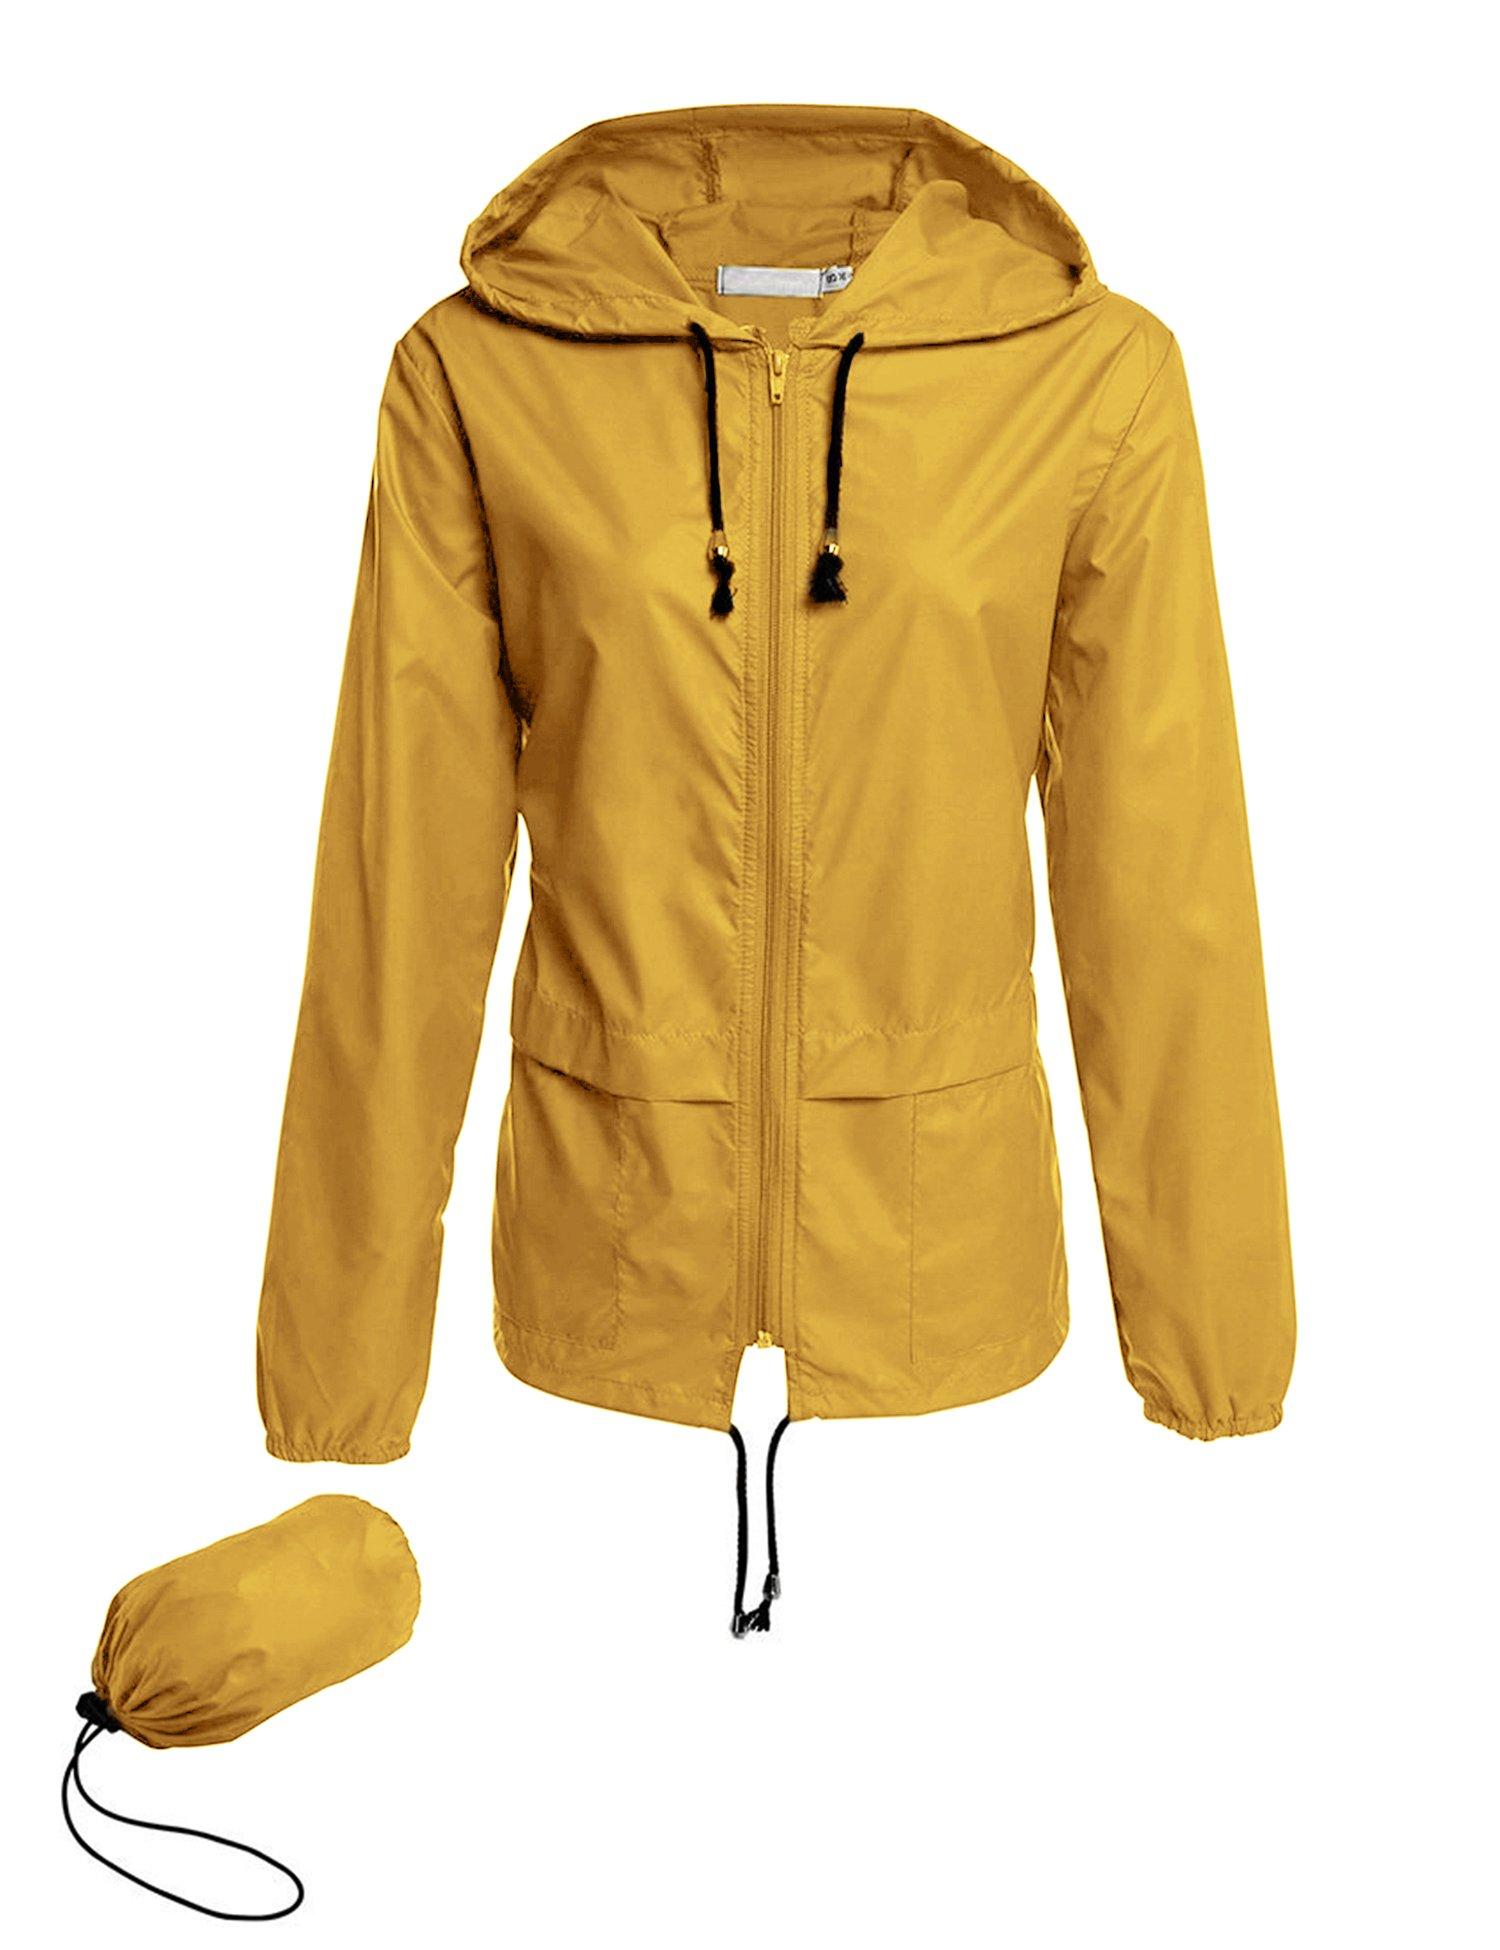 Avoogue Lightweight Raincoat Women's Waterproof Windbreaker Packable Outdoor Hooded Rain Jacket Yellow XXL by Avoogue